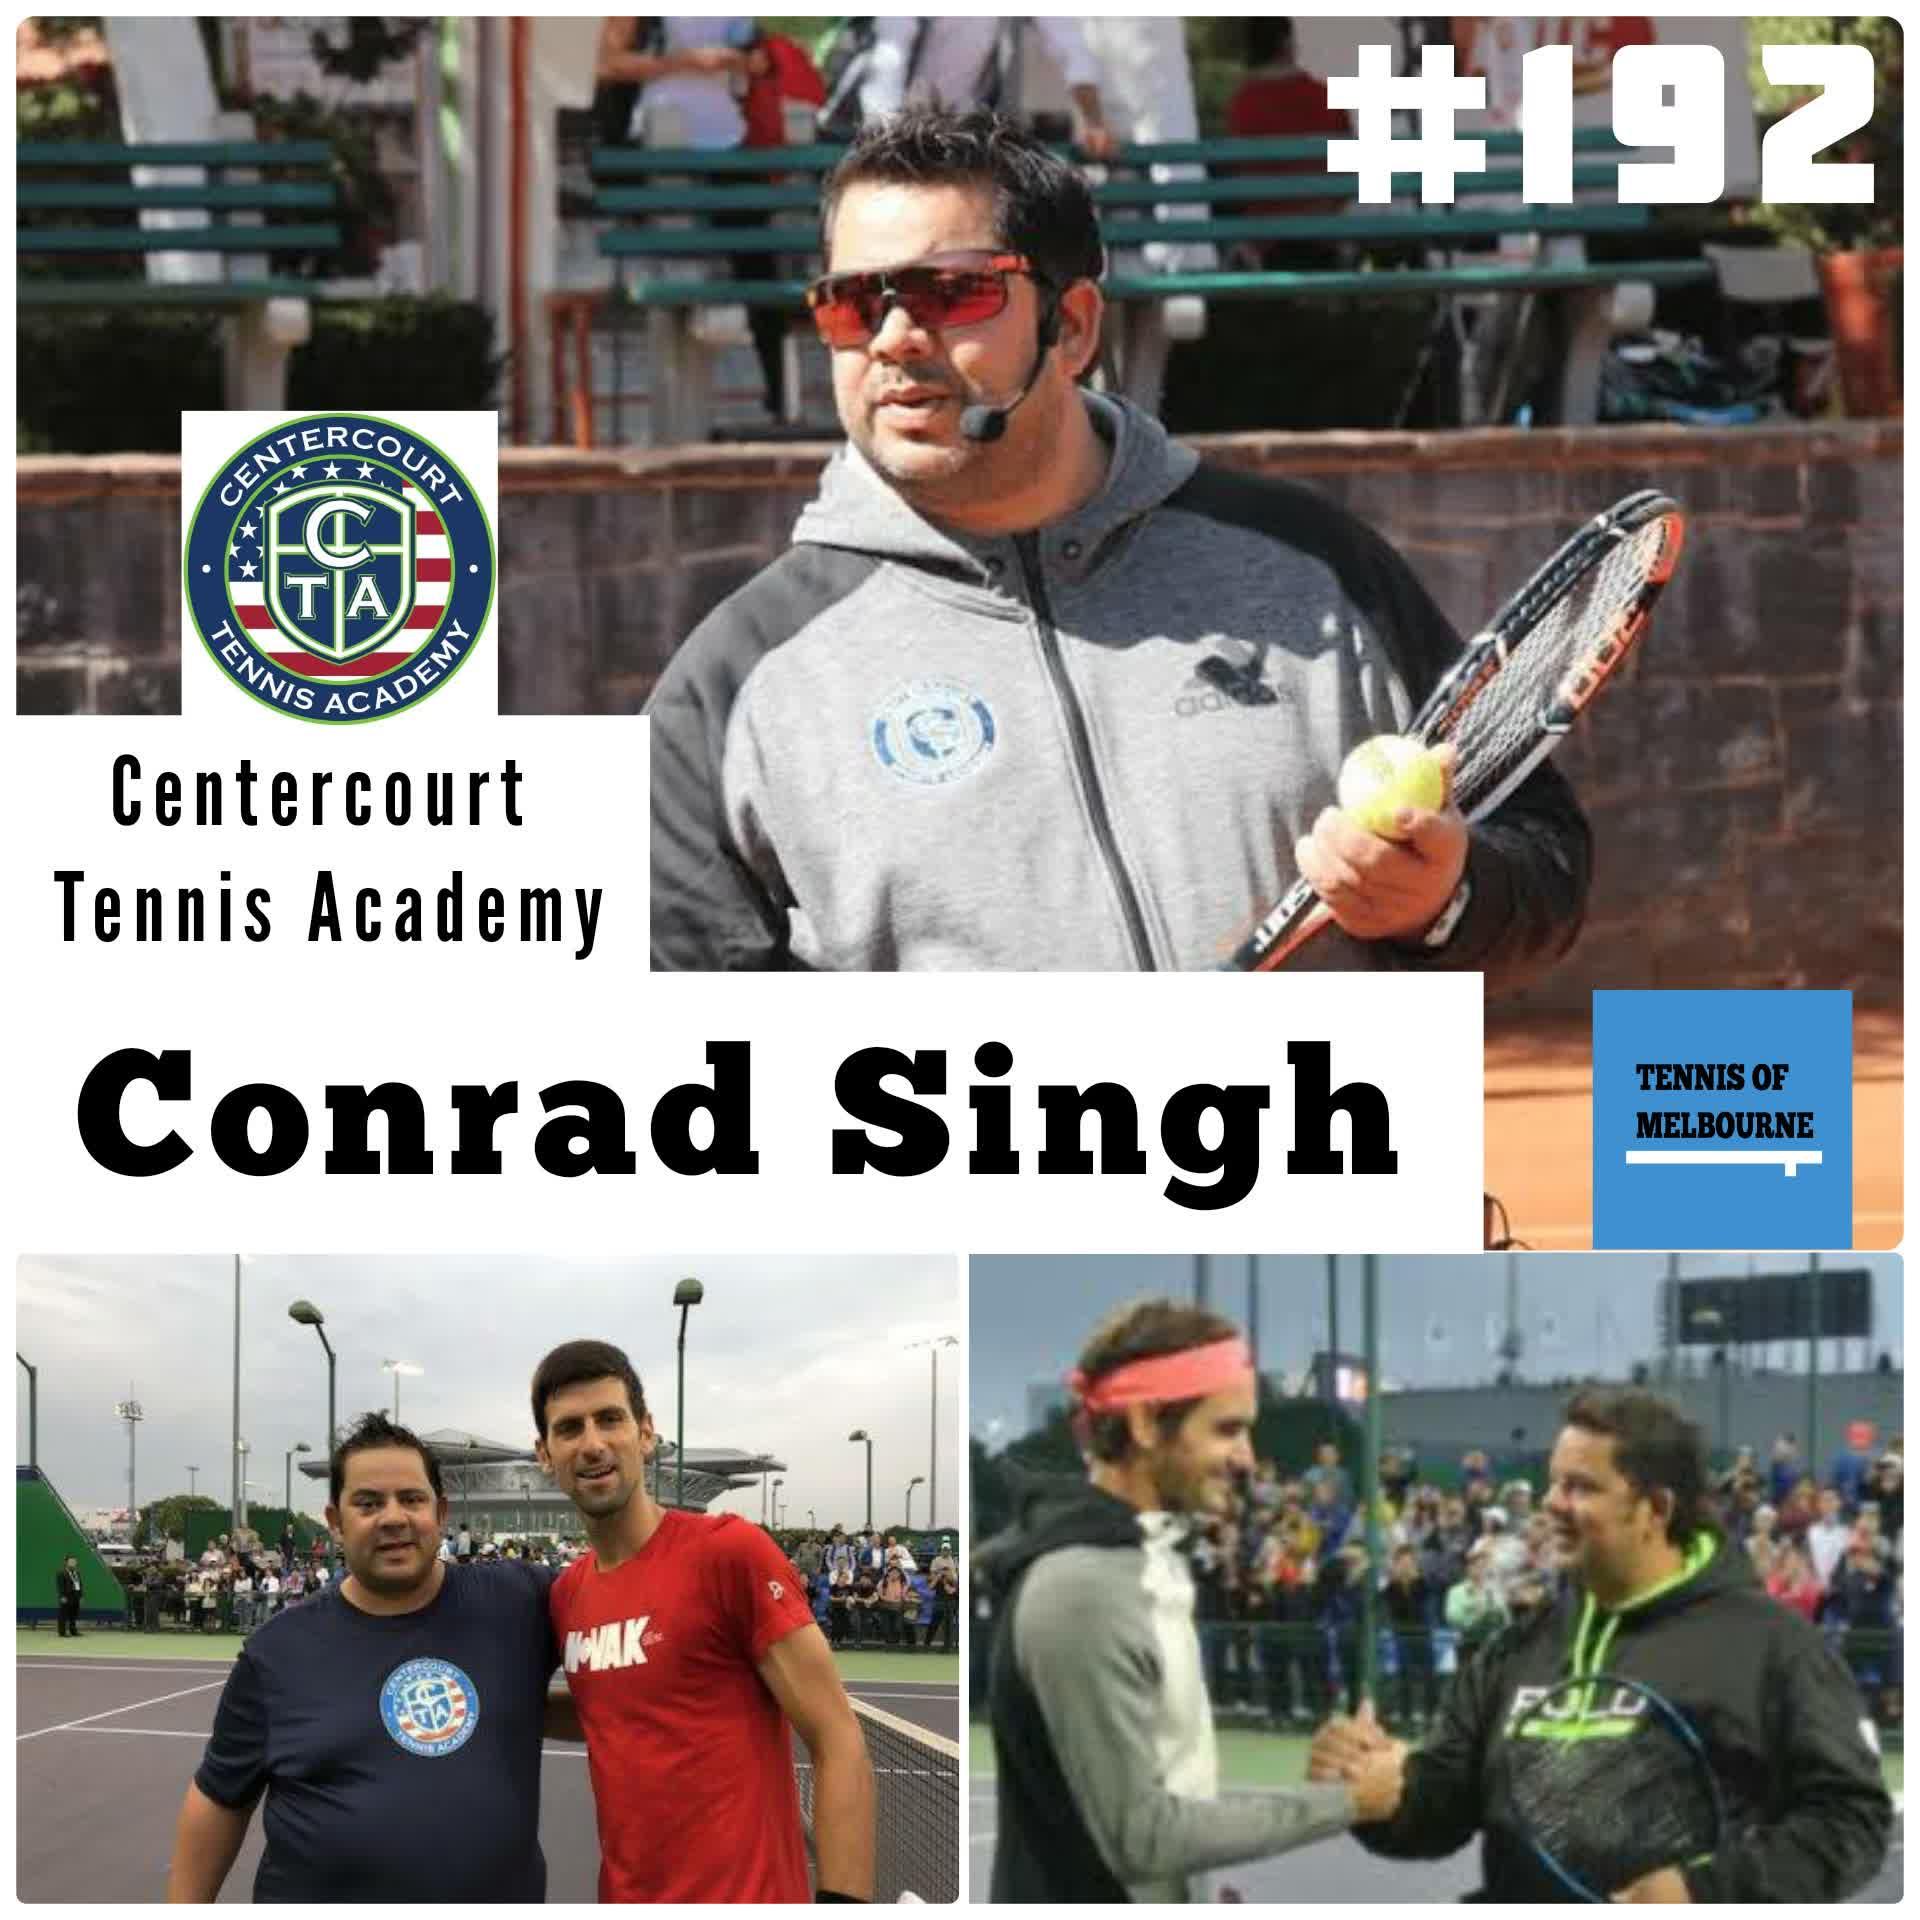 #192 Conrad Singh | Centercourt Tennis Academy